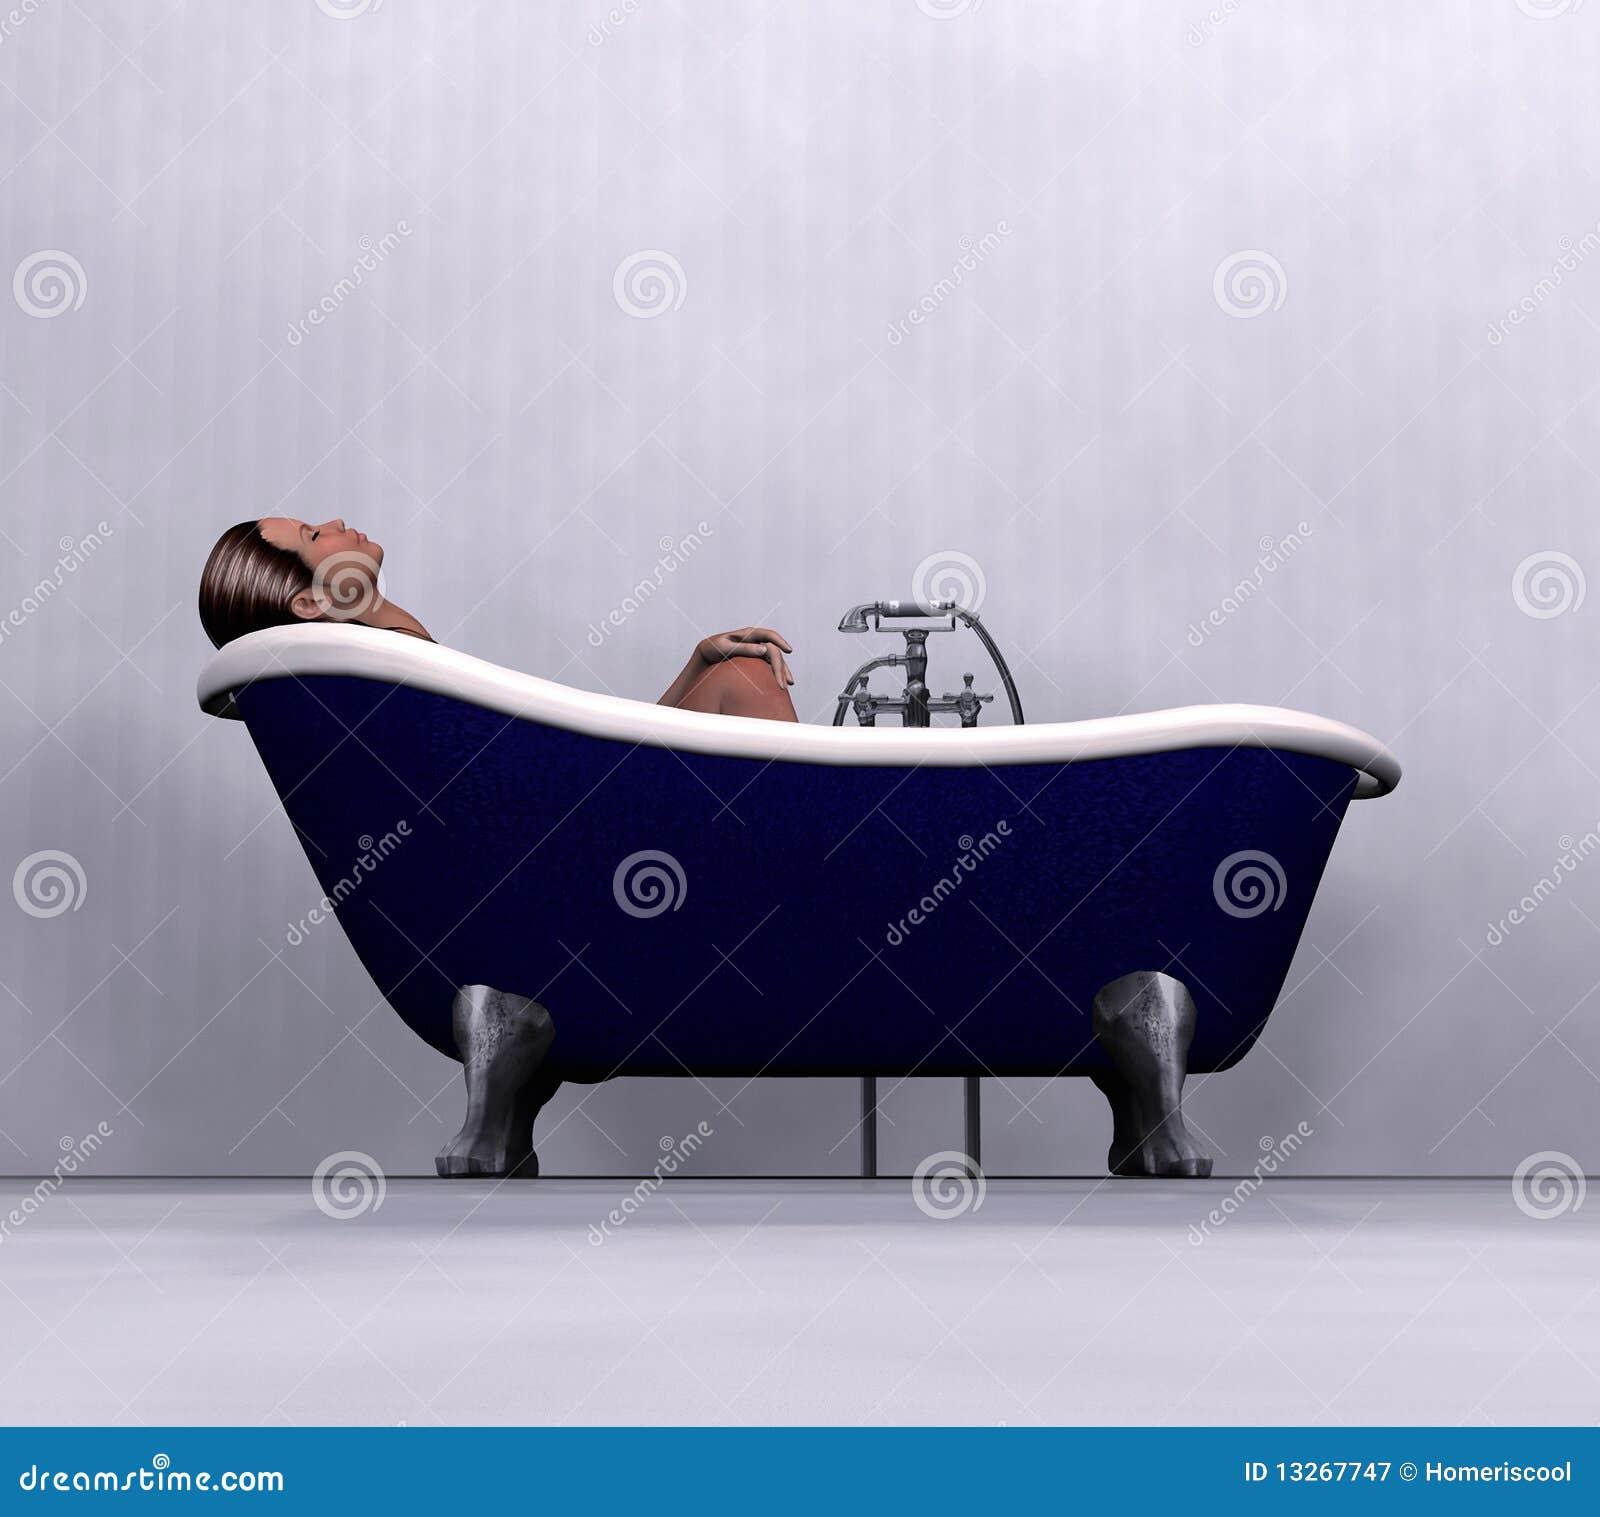 Woman relaxing in bathtub stock illustration. Illustration of ...